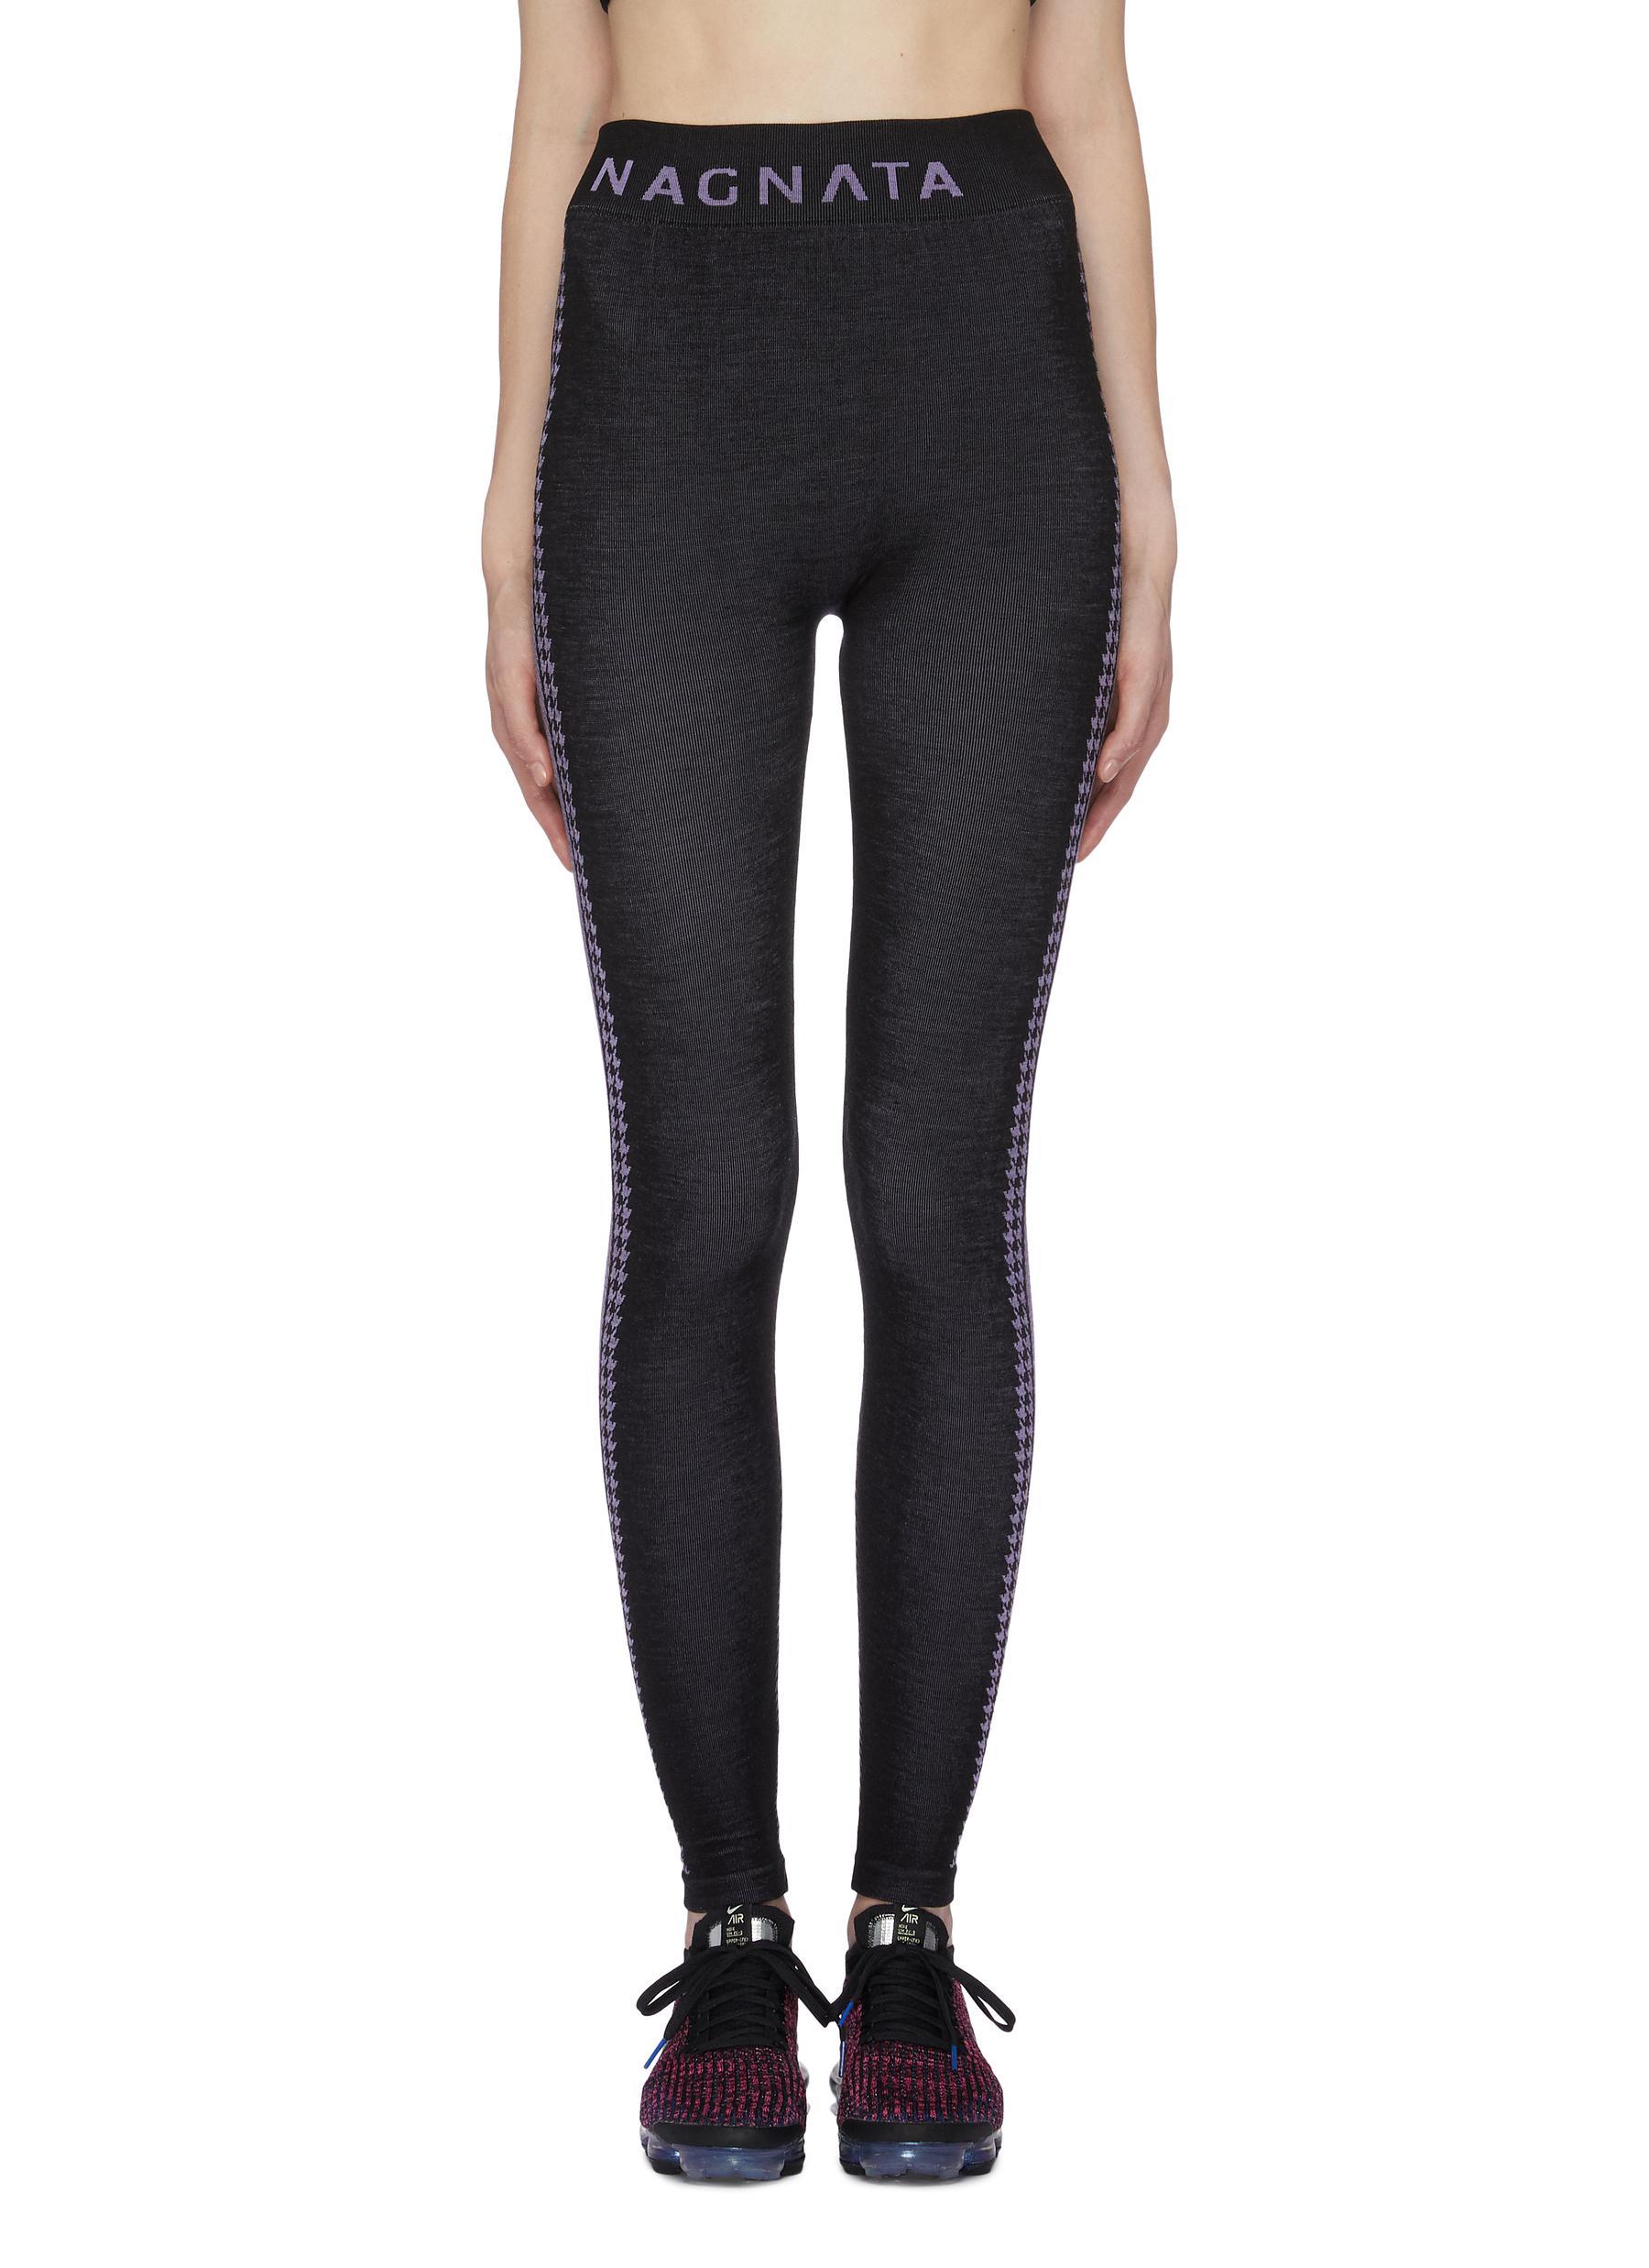 Laya houndstooth check jacquard stripe outseam performance leggings by Nagnata